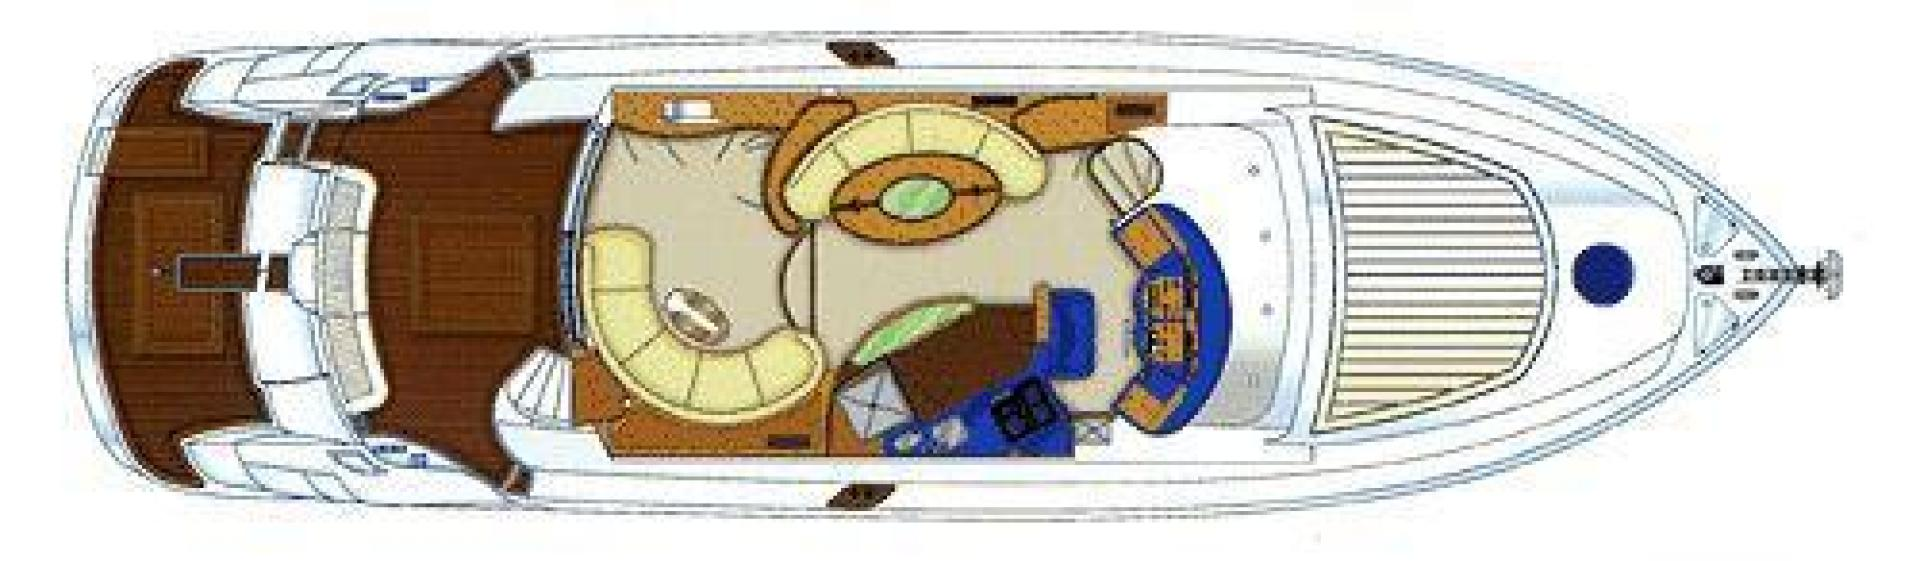 Aicon 2004-Dreamers Coral Gables-Florida-United States-1297737   Thumbnail